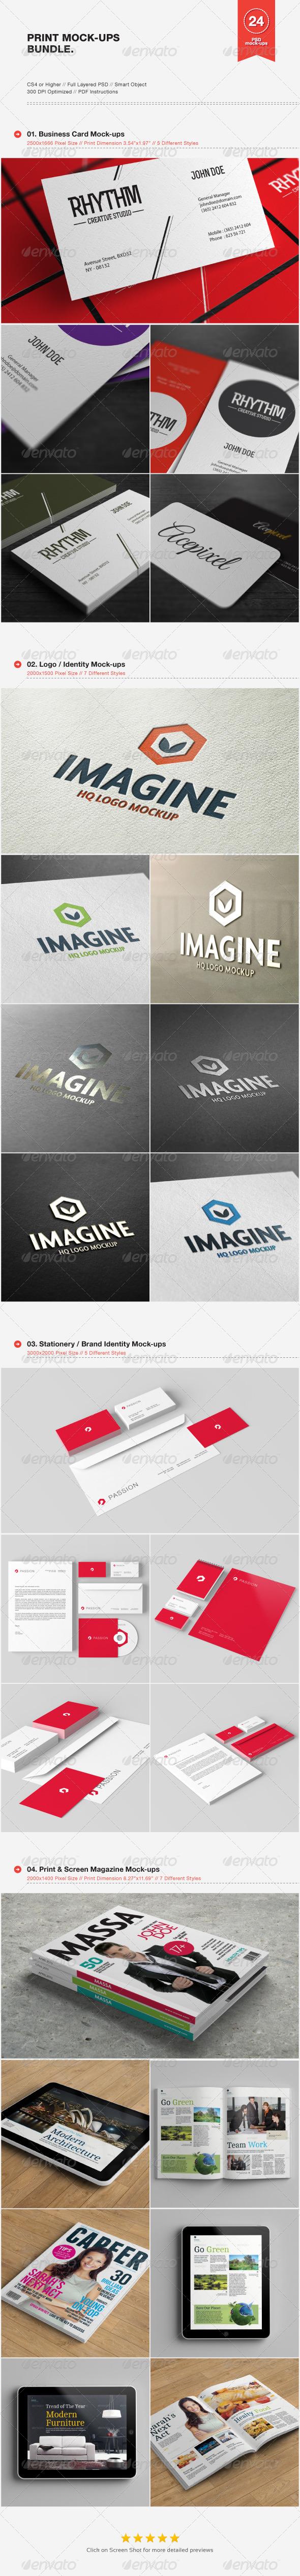 Print Mock-ups Bundle - Print Product Mock-Ups